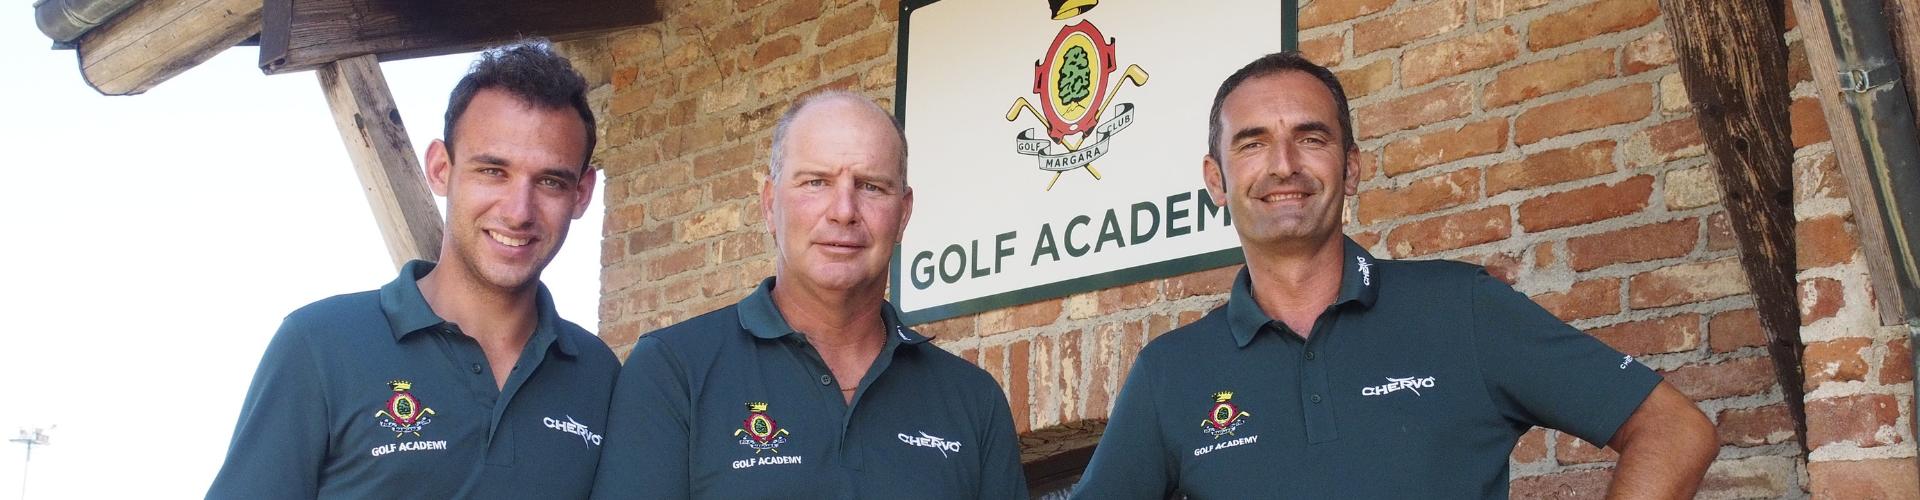 Margara golf Academy